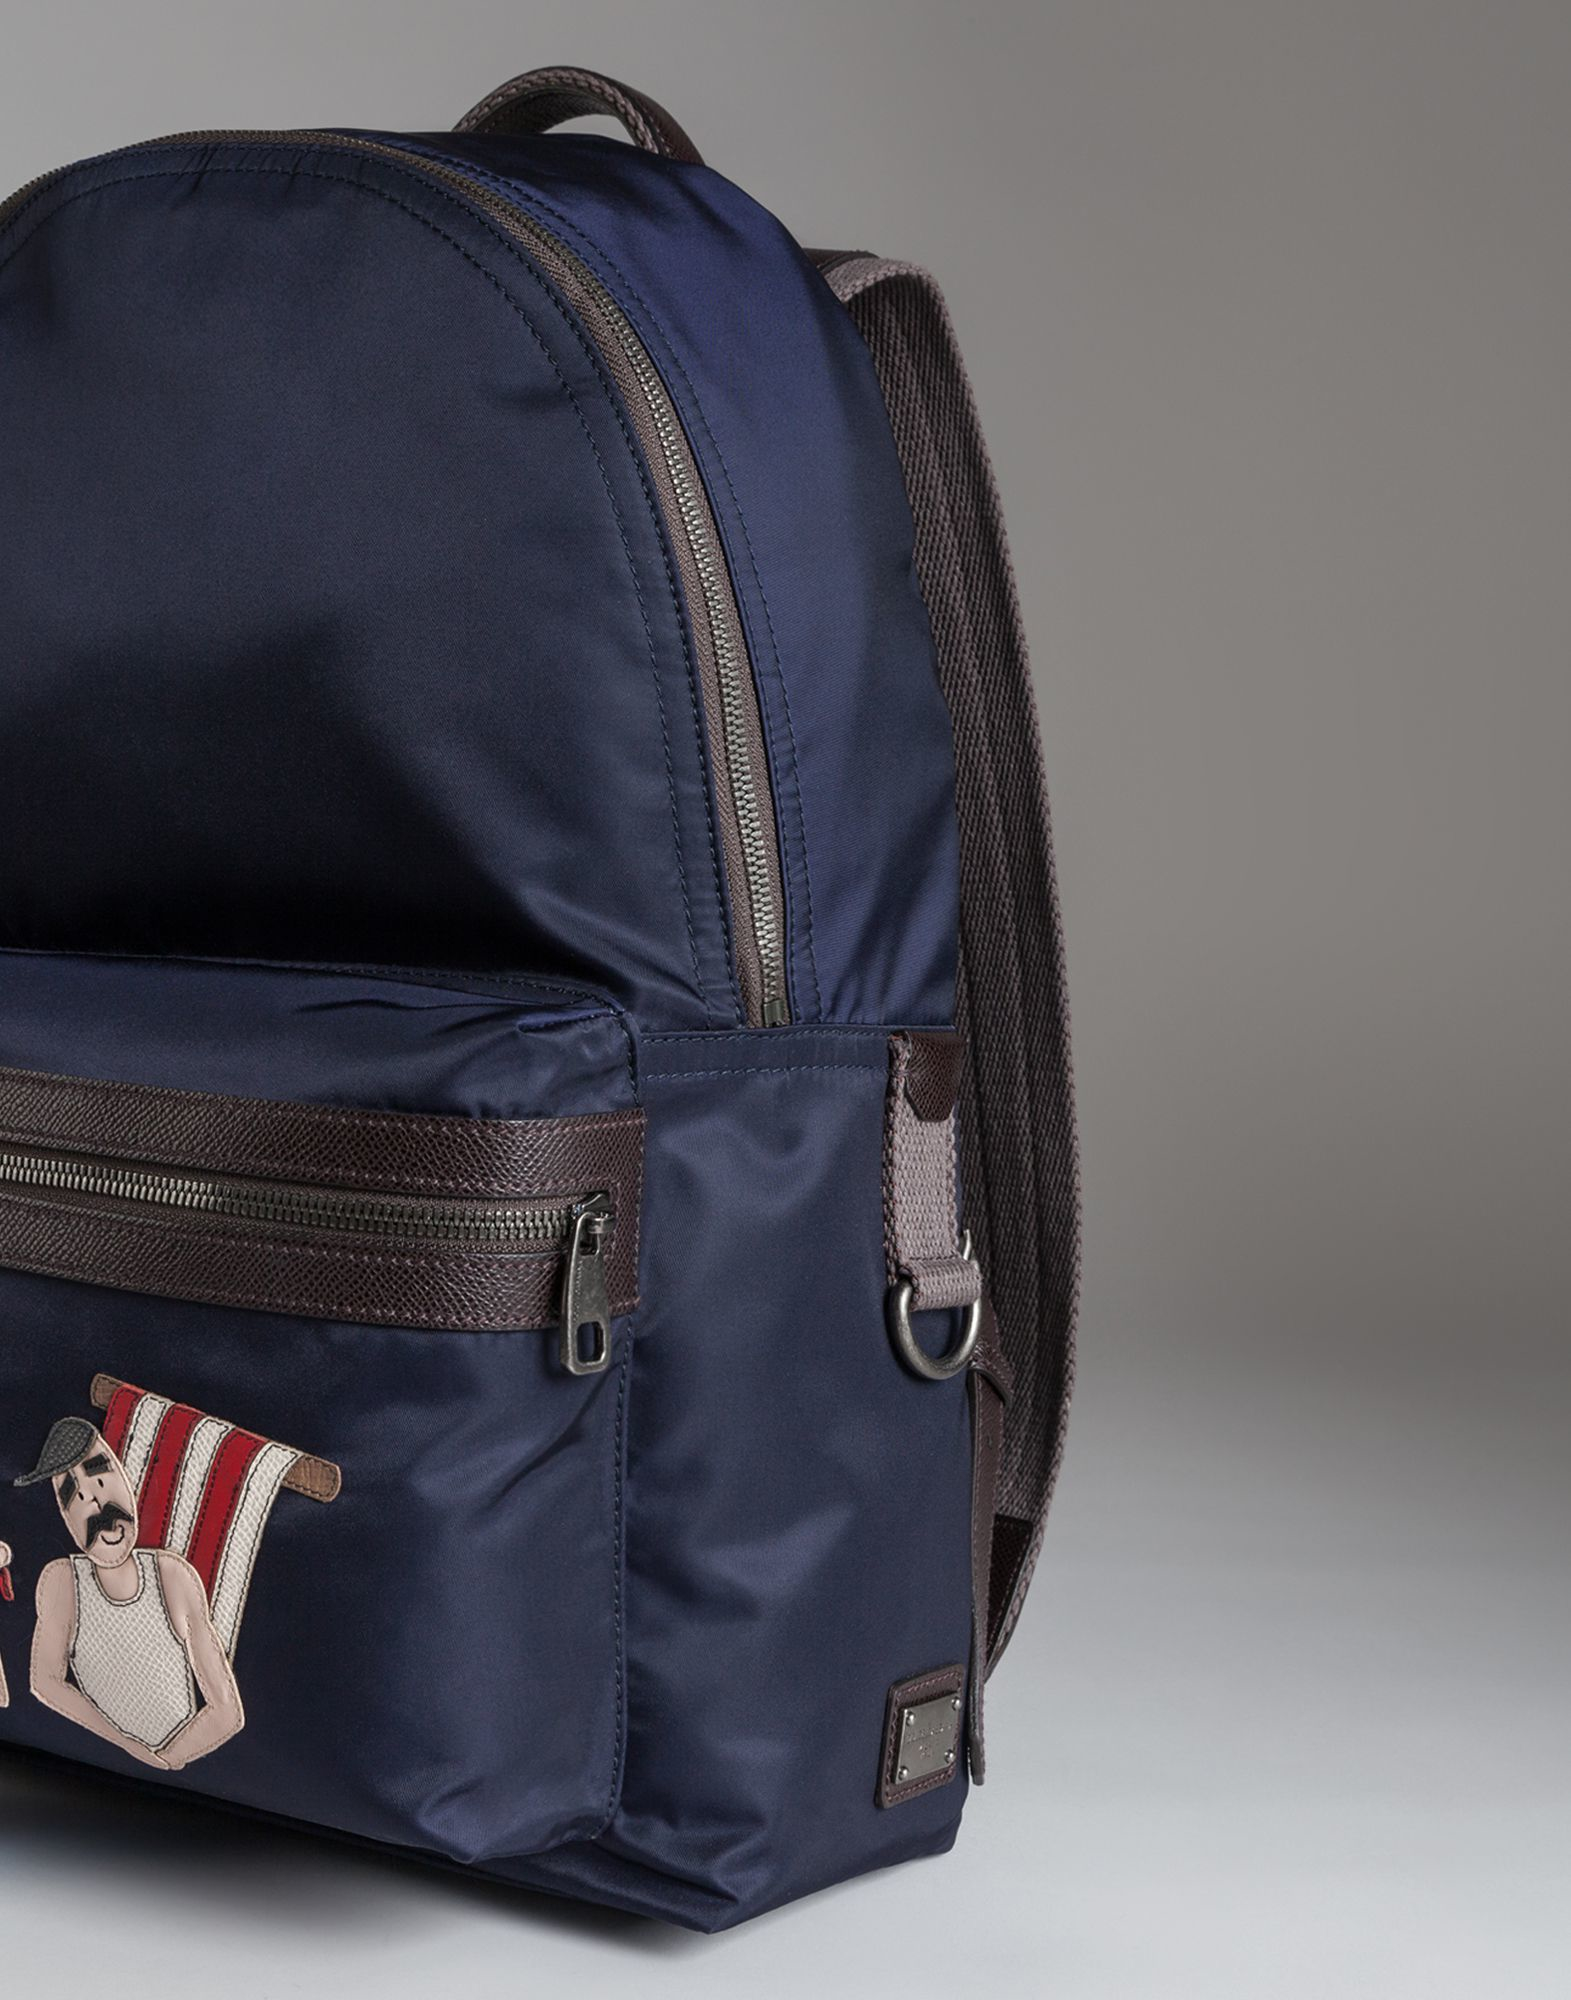 Mens Blue Classic Backpack  sale retailer 65816 bcf96 Dolce Gabbana Vulcano  Backpack In Nylon With Appliqués in Blue for Men ... ec71f037e0